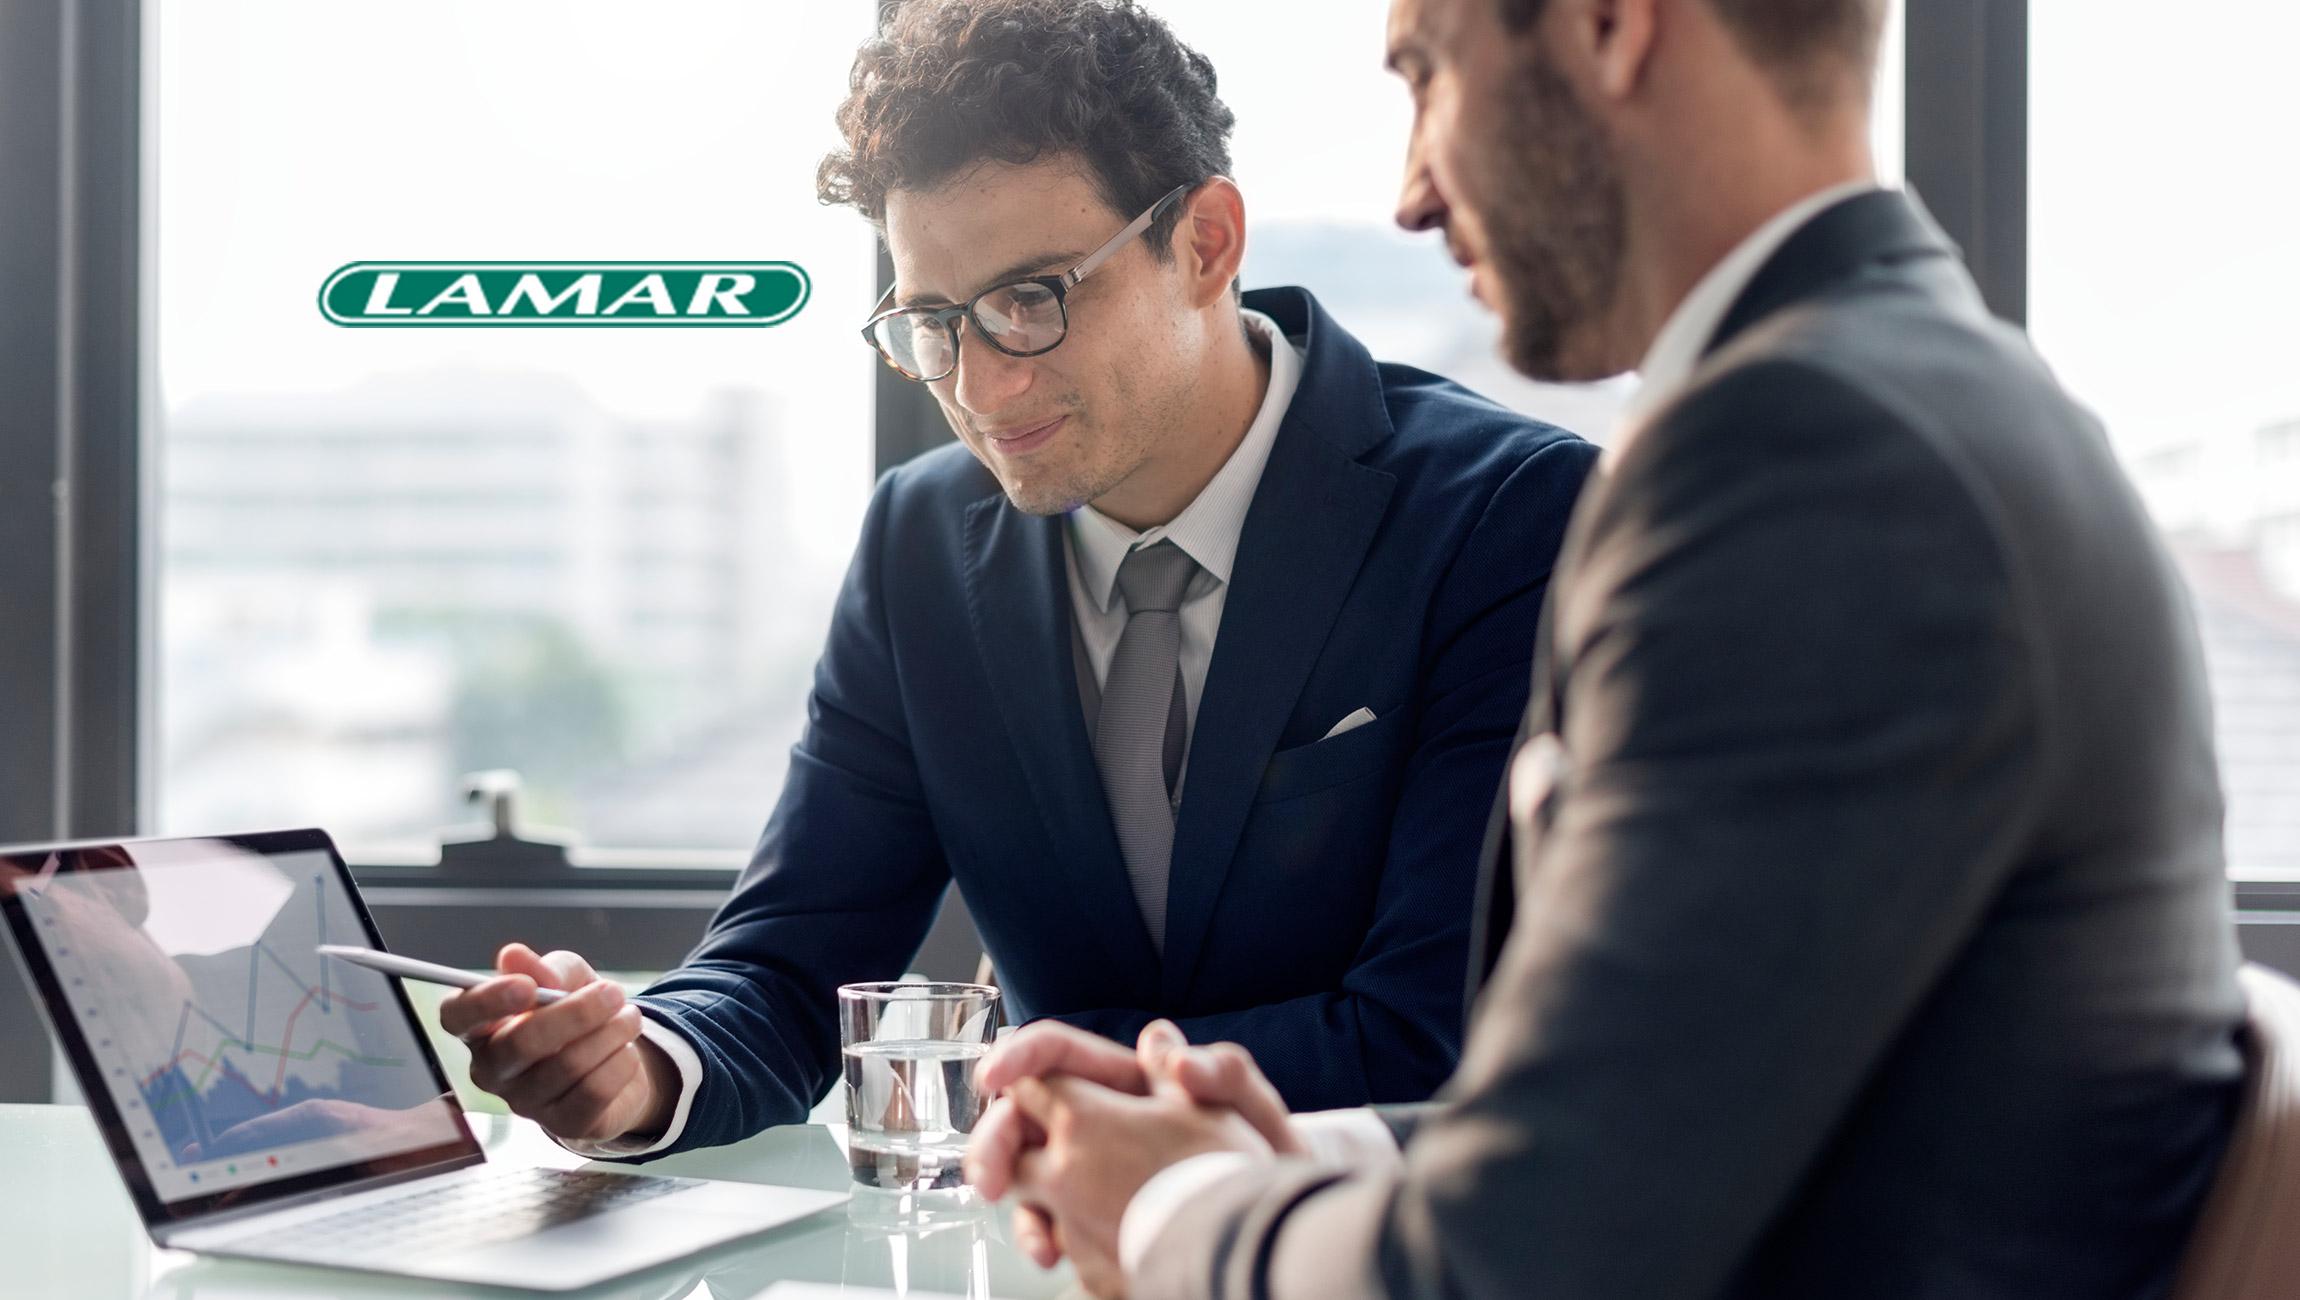 Lamar Advertising Company Acquires Five New Markets & Announces 2019 Distribution Plan